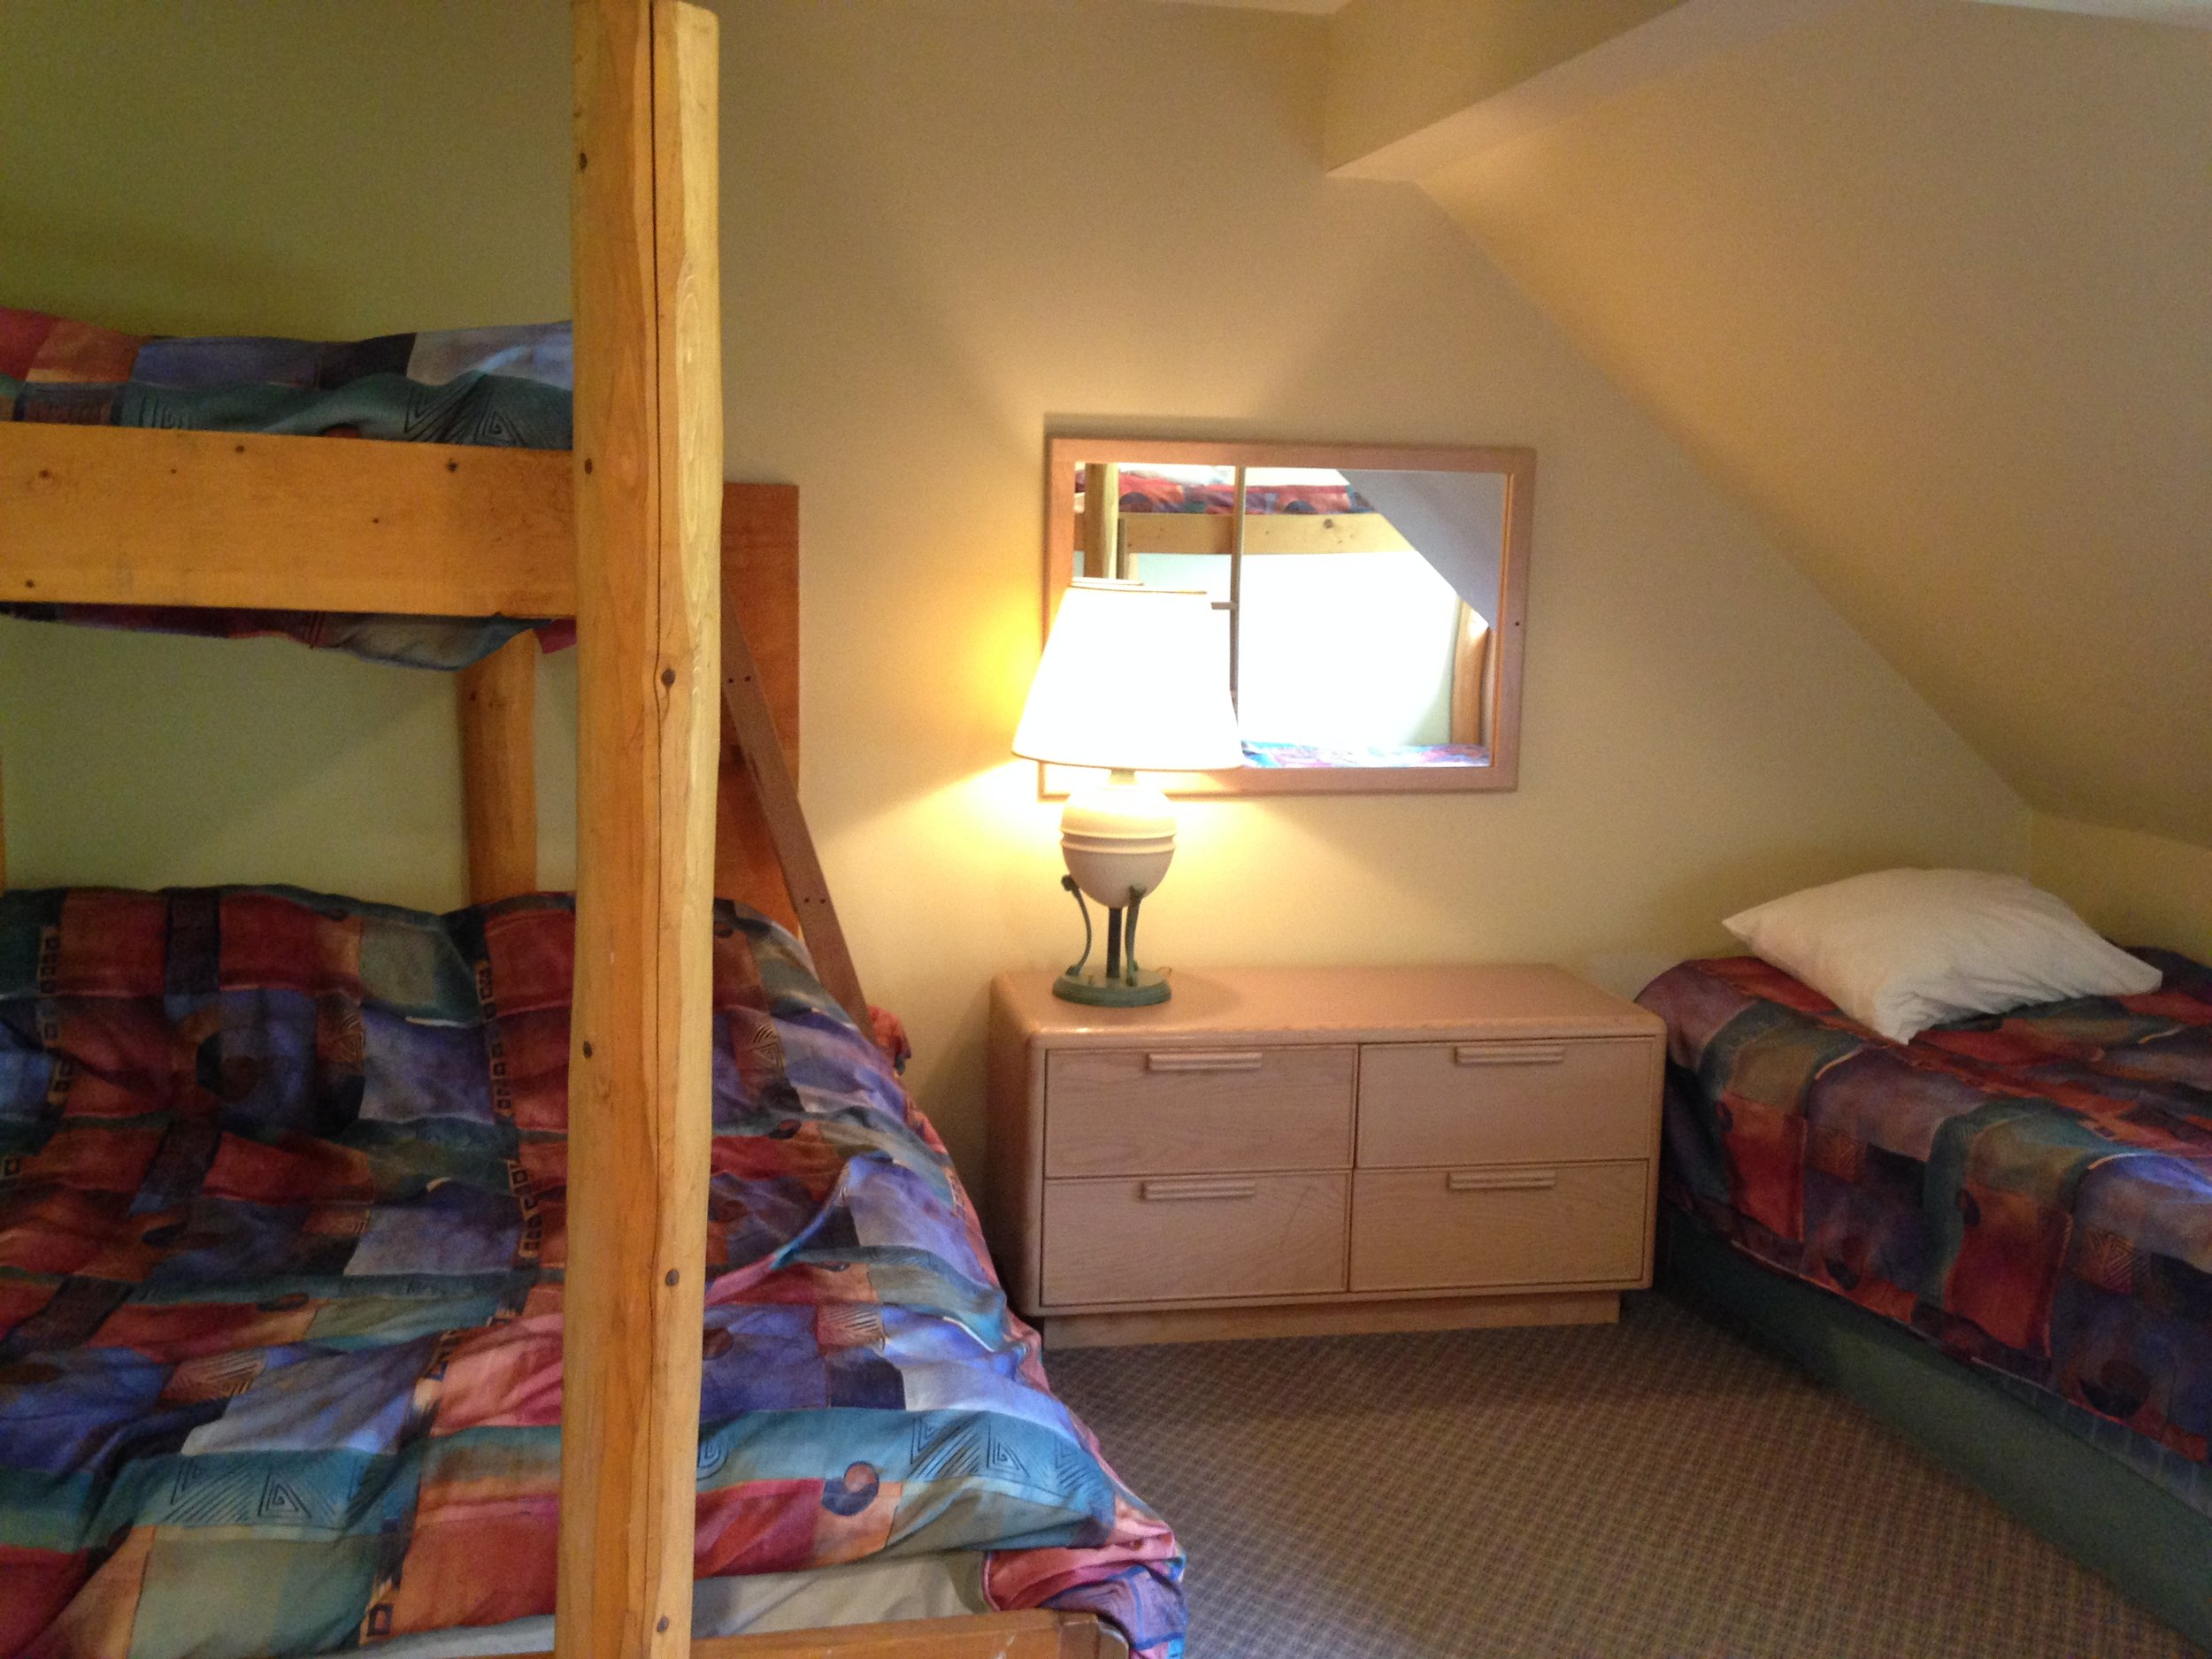 Room 307 mirror.jpeg